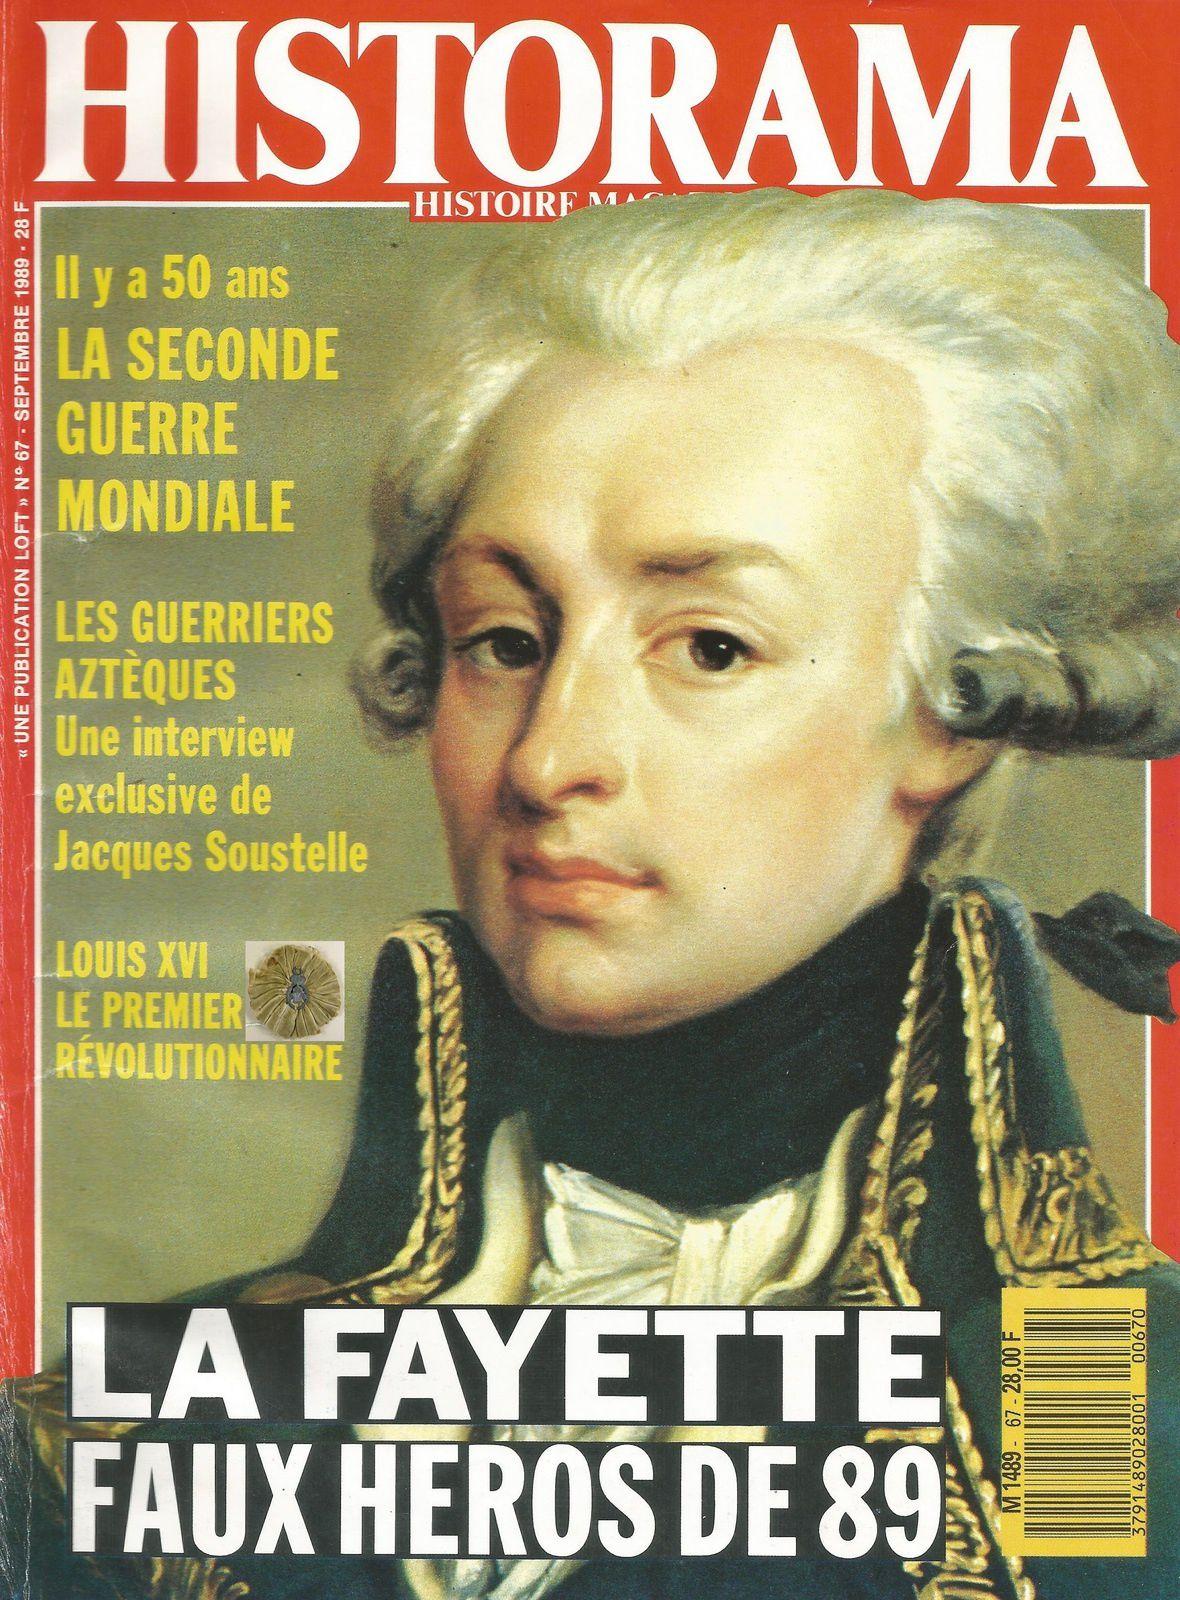 HISTORAMA 67 - LA FAYETTE FAUX HÉROS DE 89